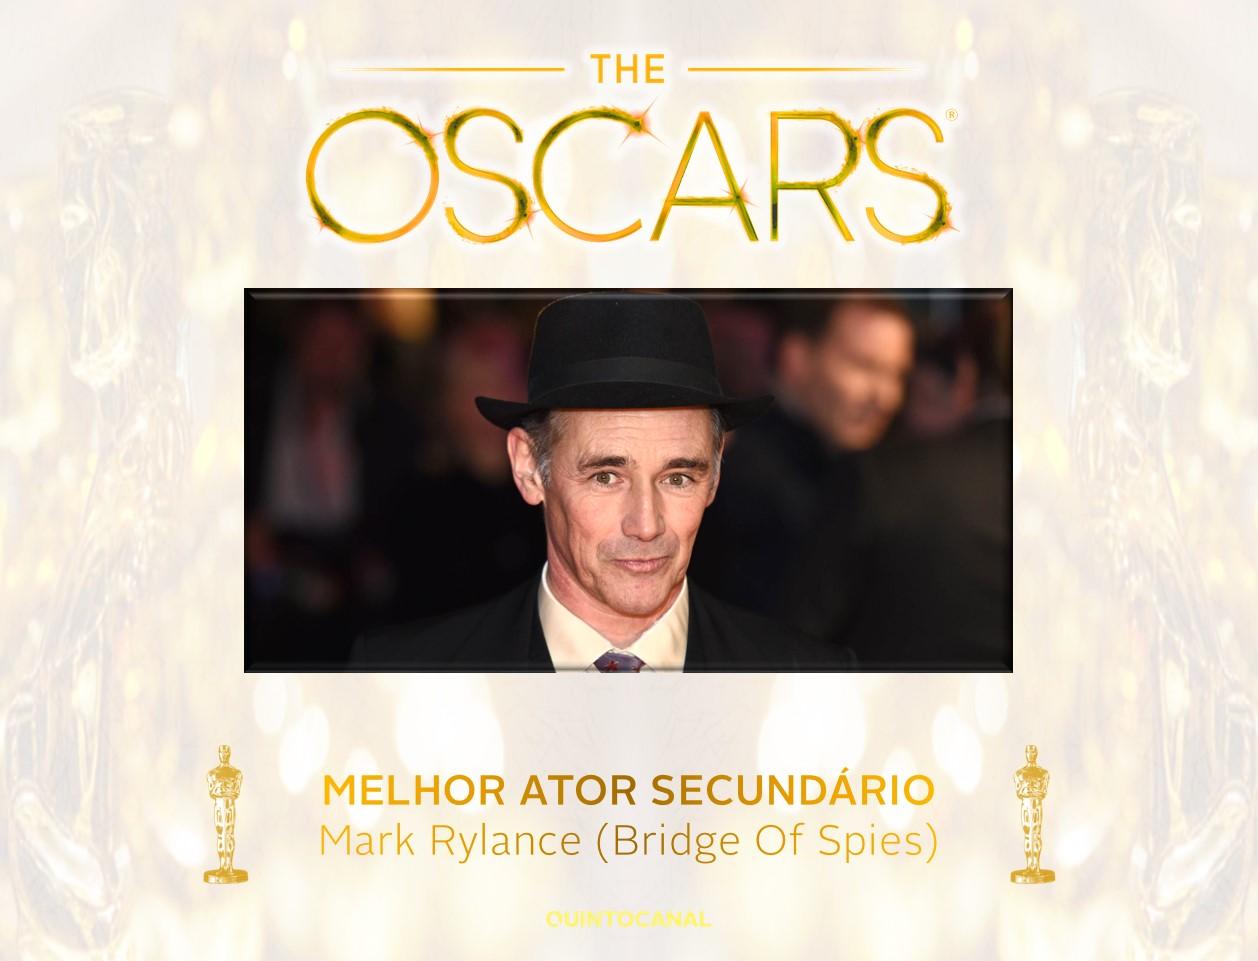 Mark Rylance (Bridge Of Spies)